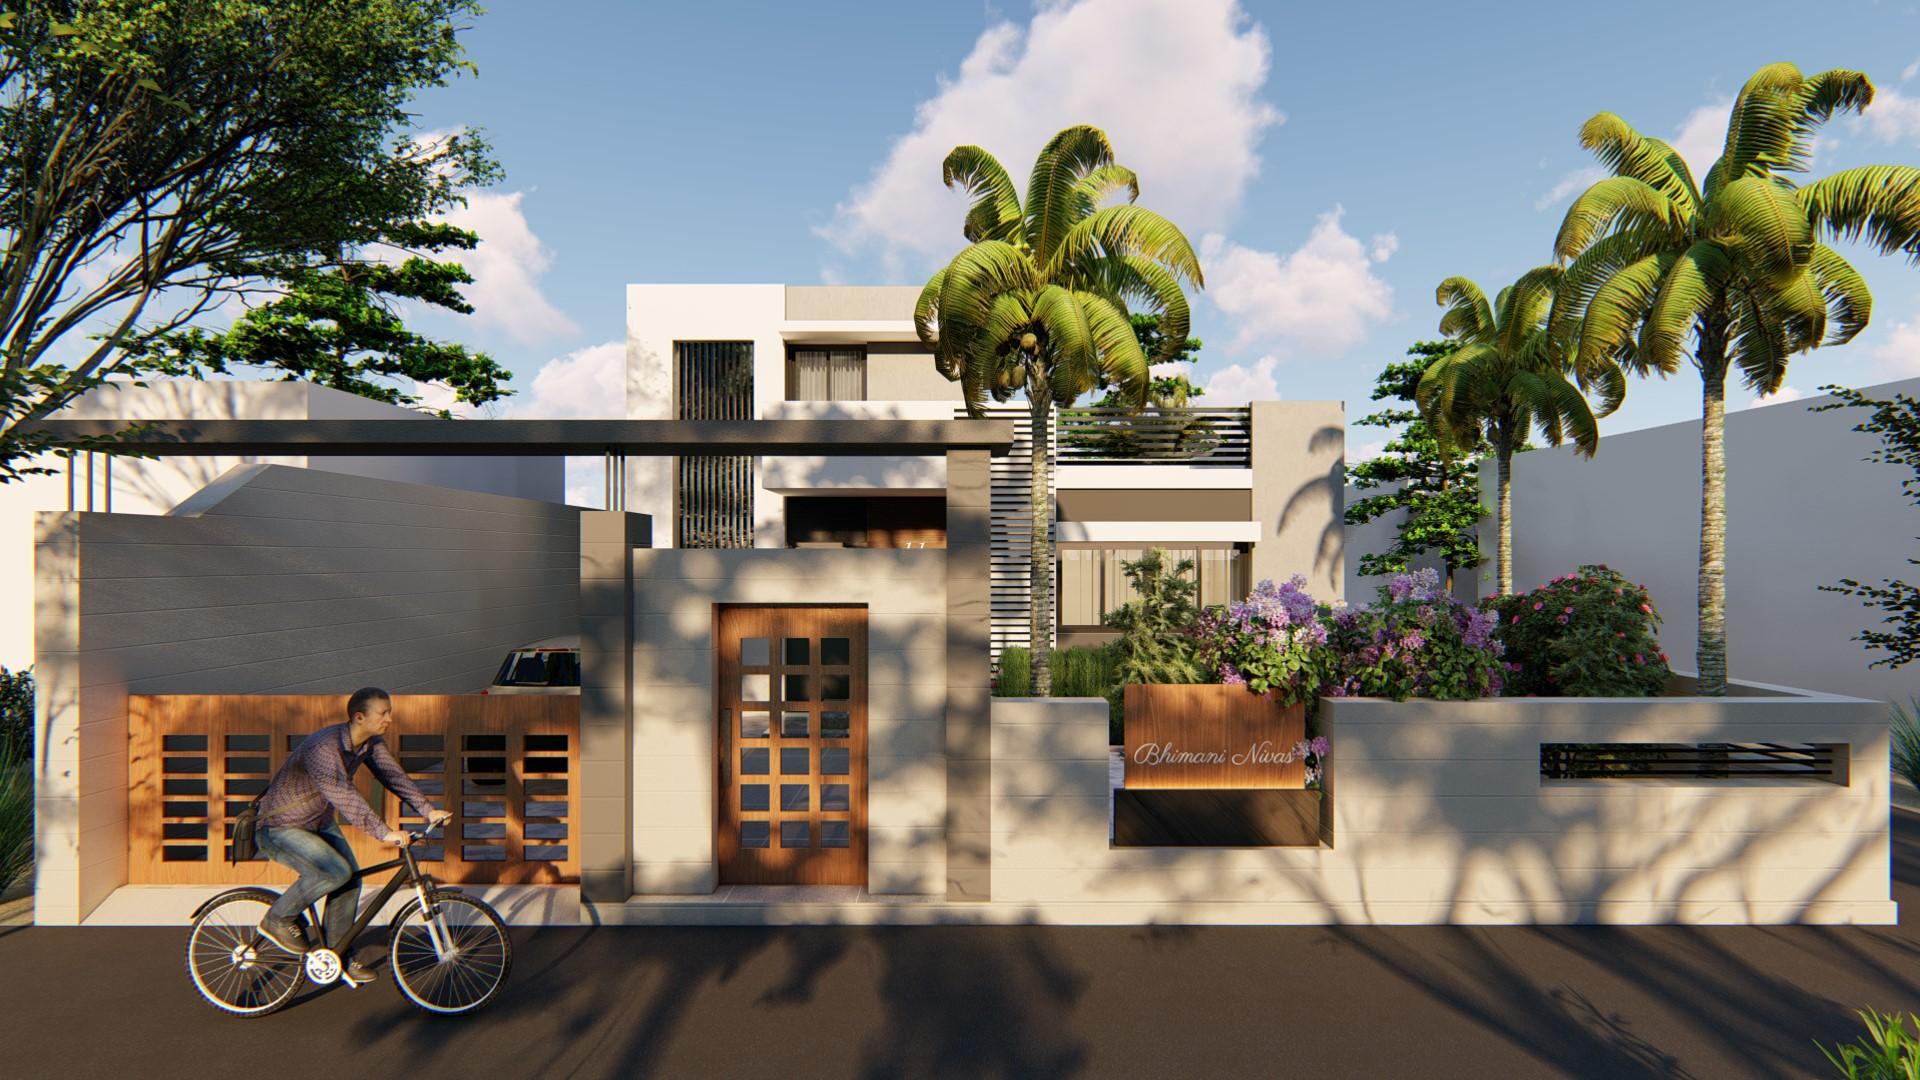 Bhimani Nivas House View